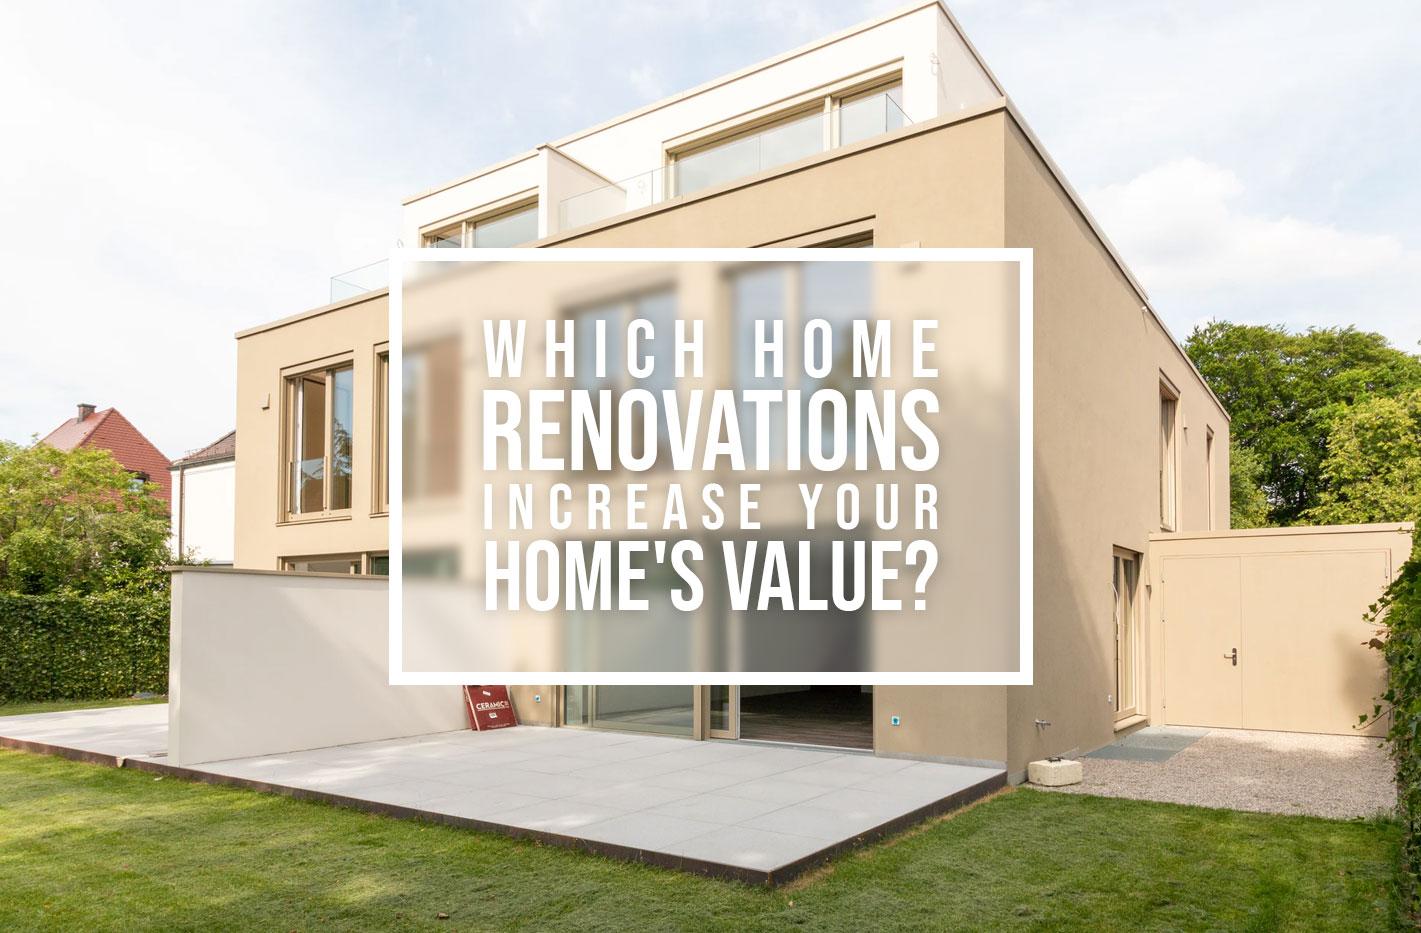 miller home renovations south florida